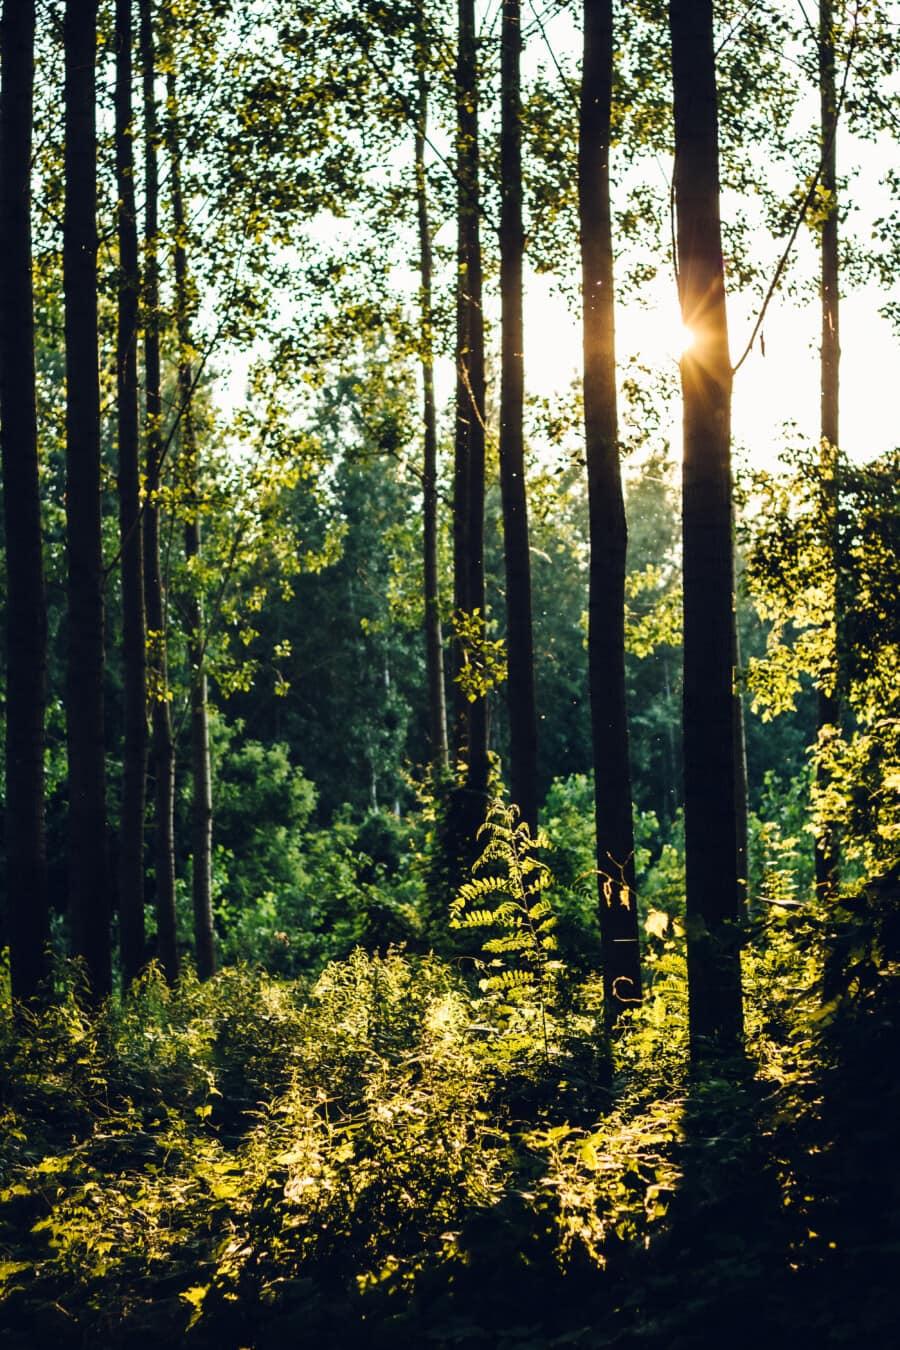 darkness, sun, silhouette, sunlight, forest, sunrays, wood, autumn, trees, landscape